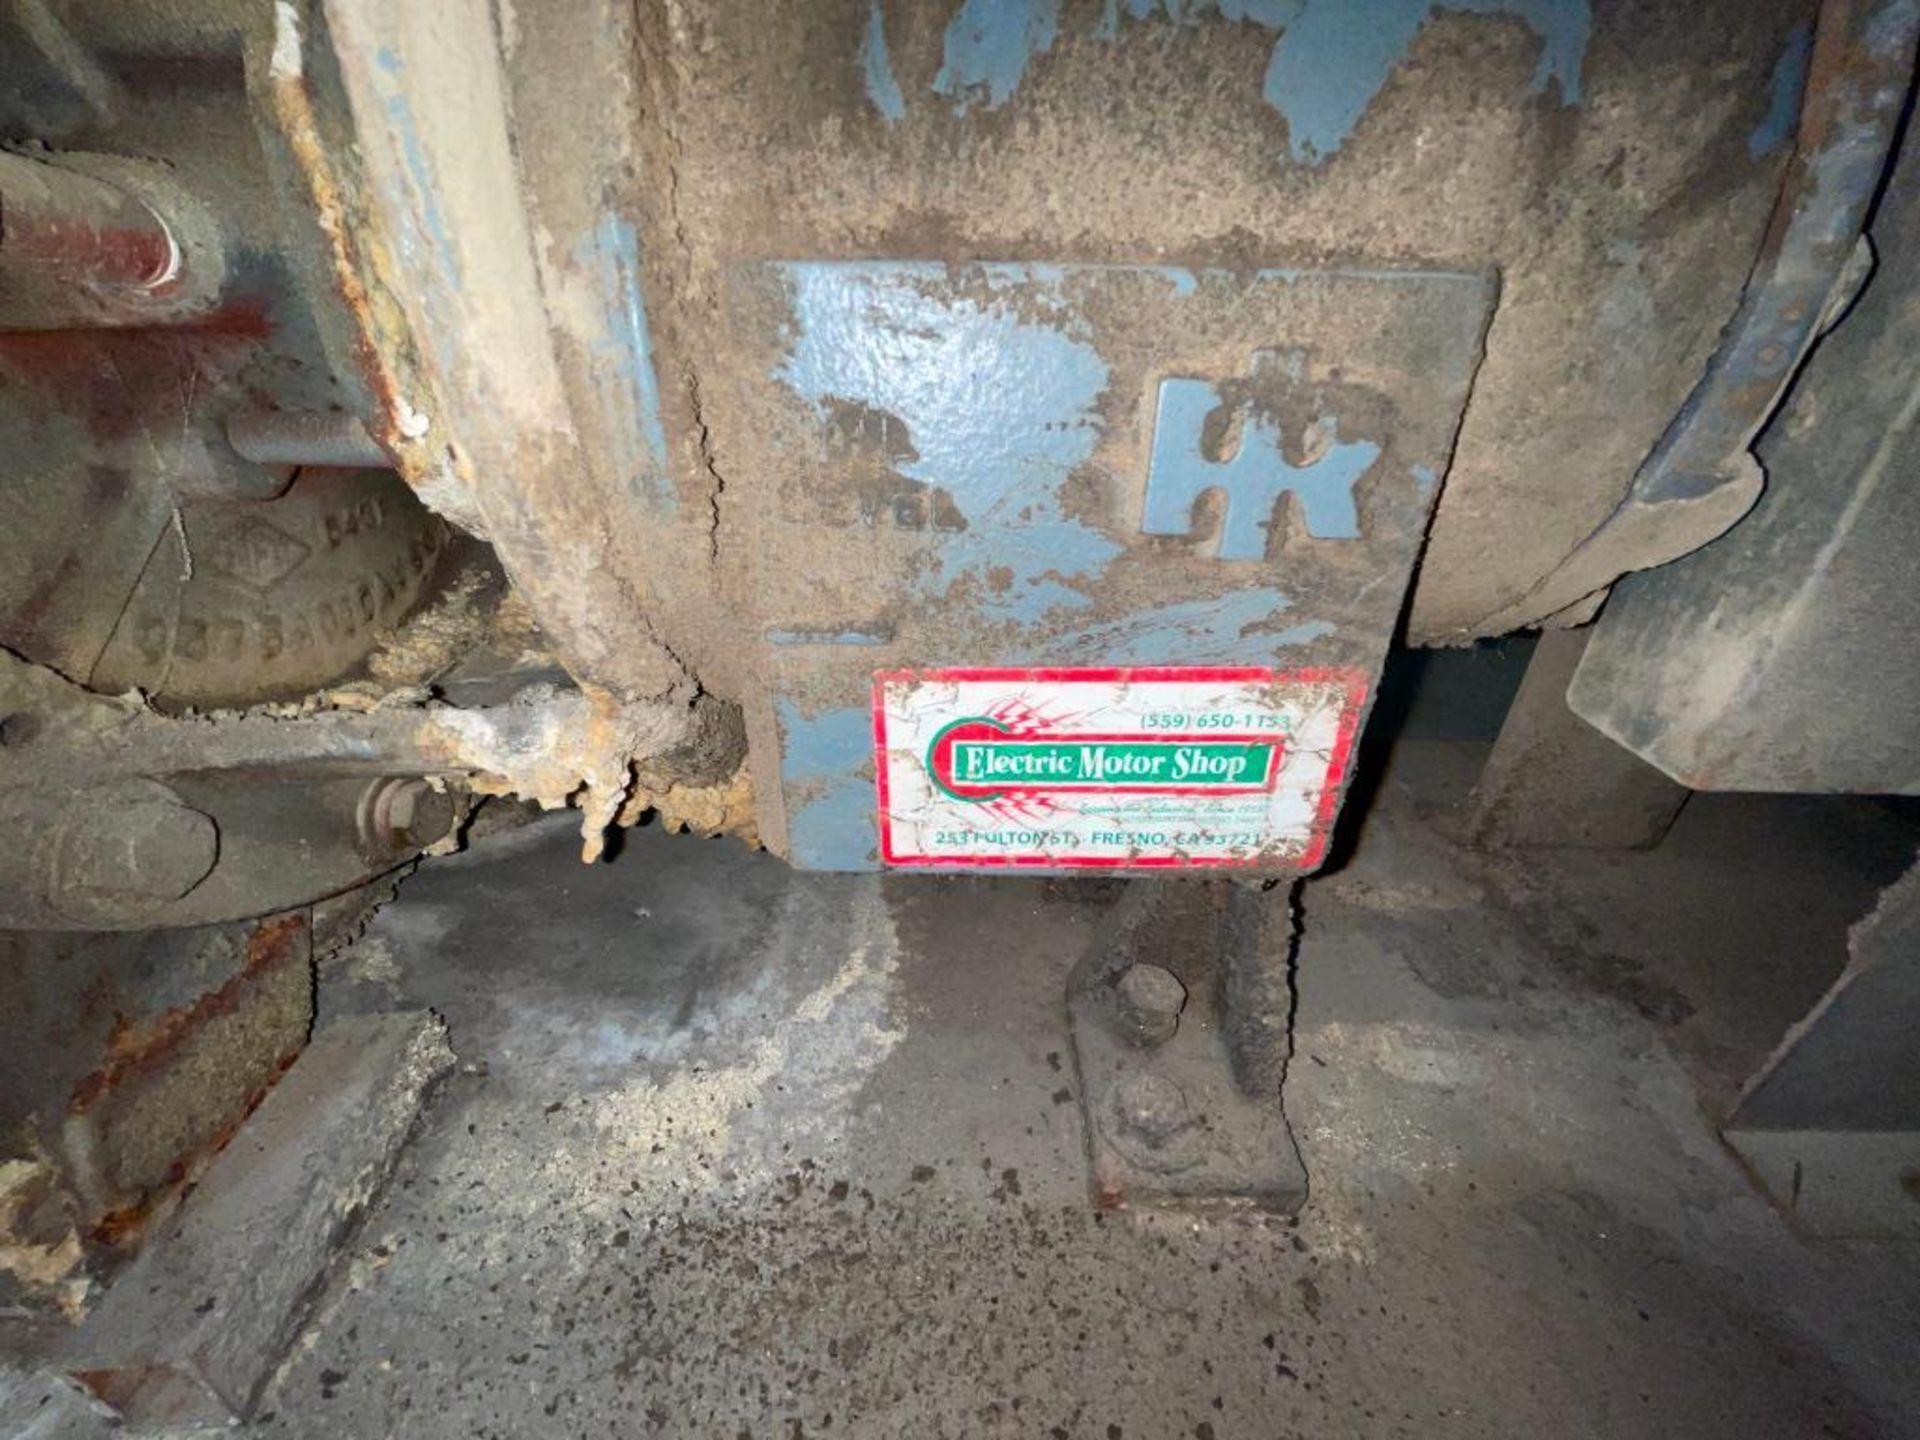 Ingersoll Dresser high temperature water pump - Image 3 of 9